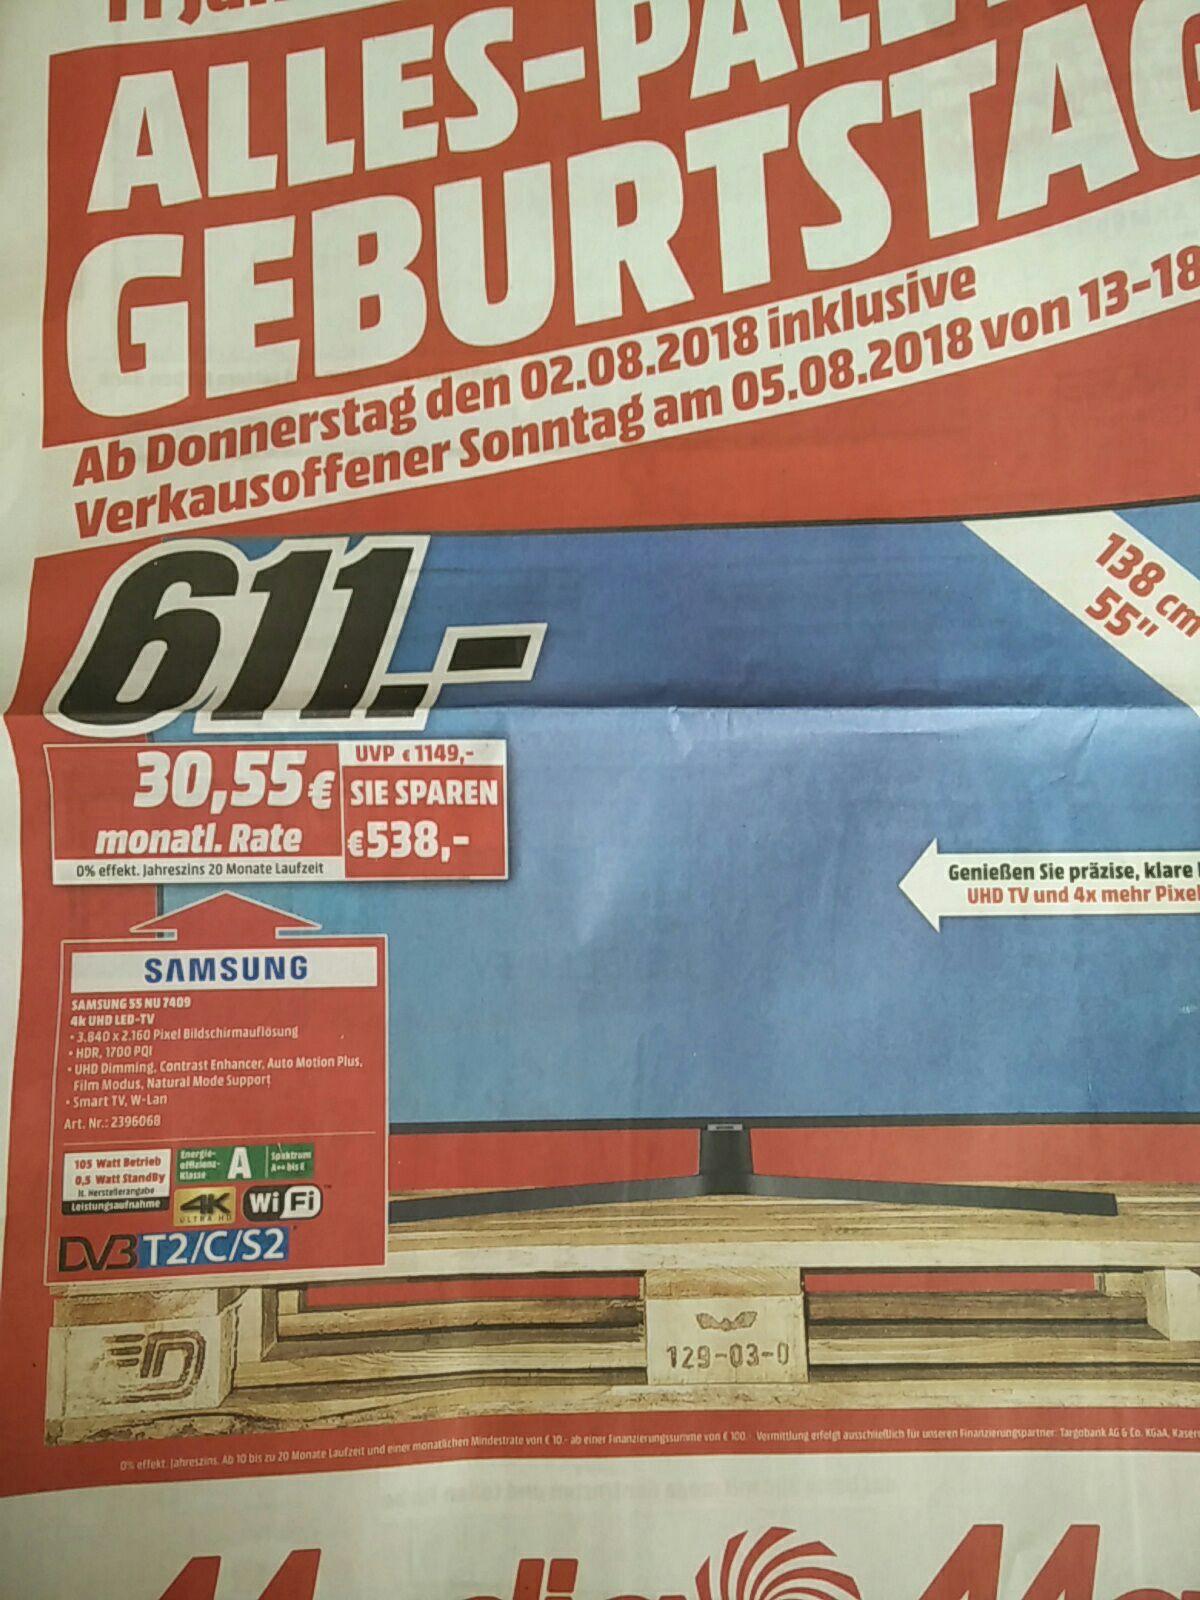 Lokal - Samsung NU7409 138 cm (55 Zoll) LED Fernseher (Ultra HD, HDR, Triple Tuner, Smart TV) - lokal MediaMarkt Stade